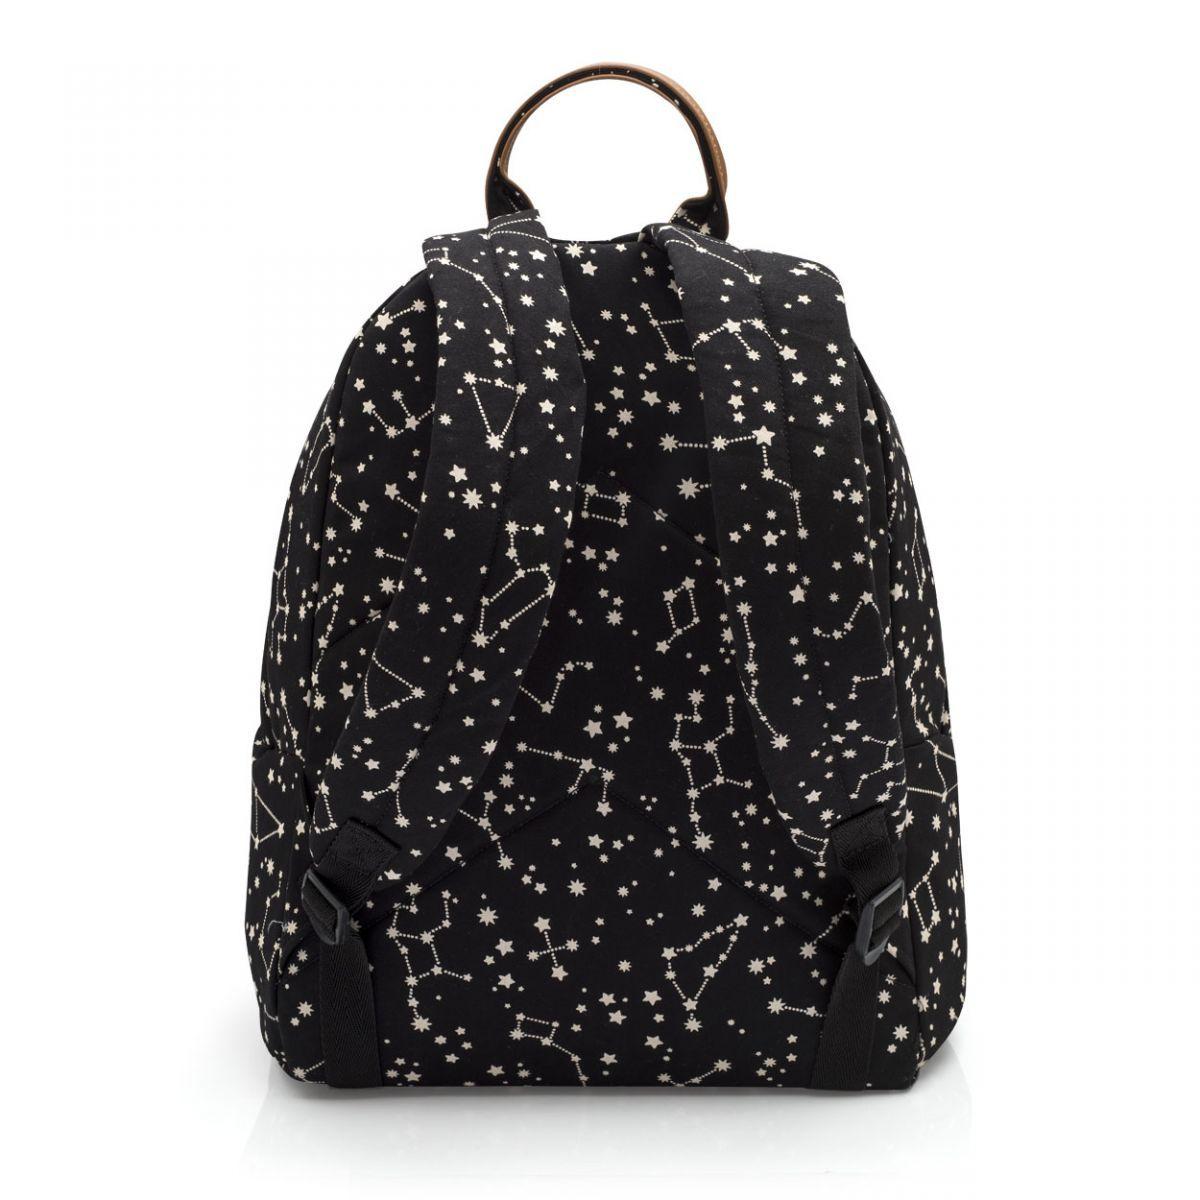 cf4d3ca02 Kipling Bem Vindo Papelaria Kipling bags Bags e Backpacks